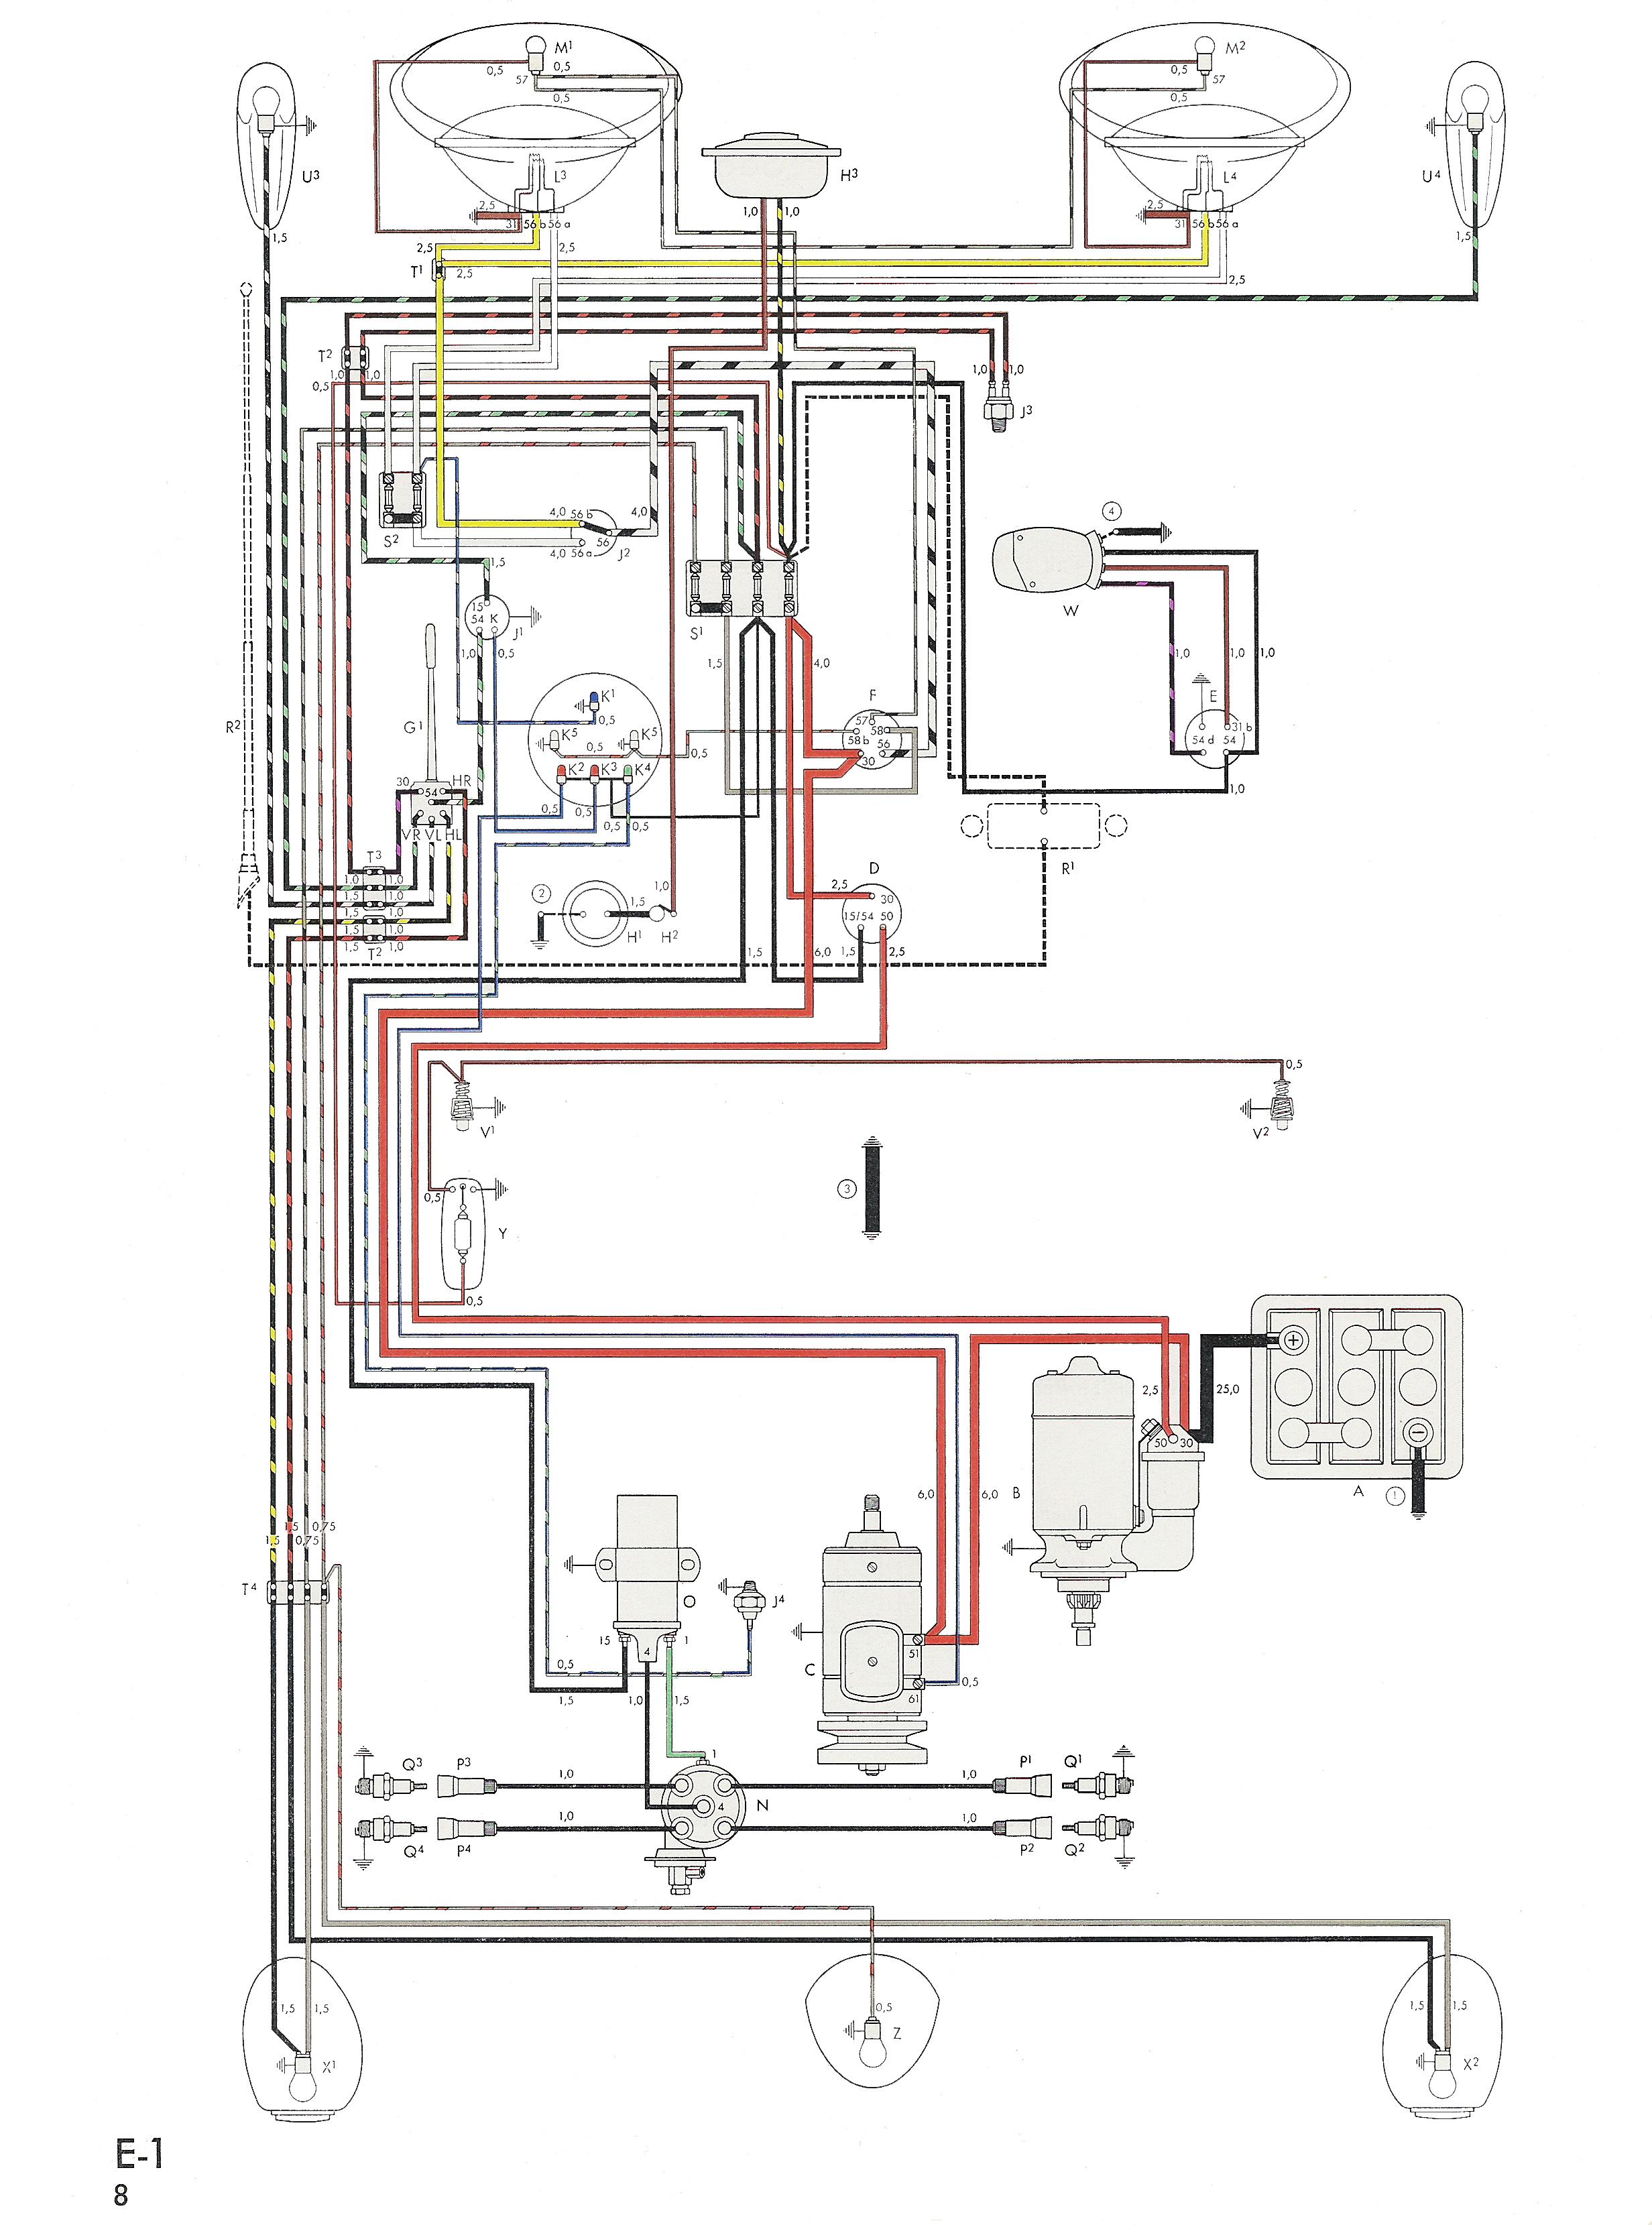 X8 Wiring Diagram | Wiring Diagram on